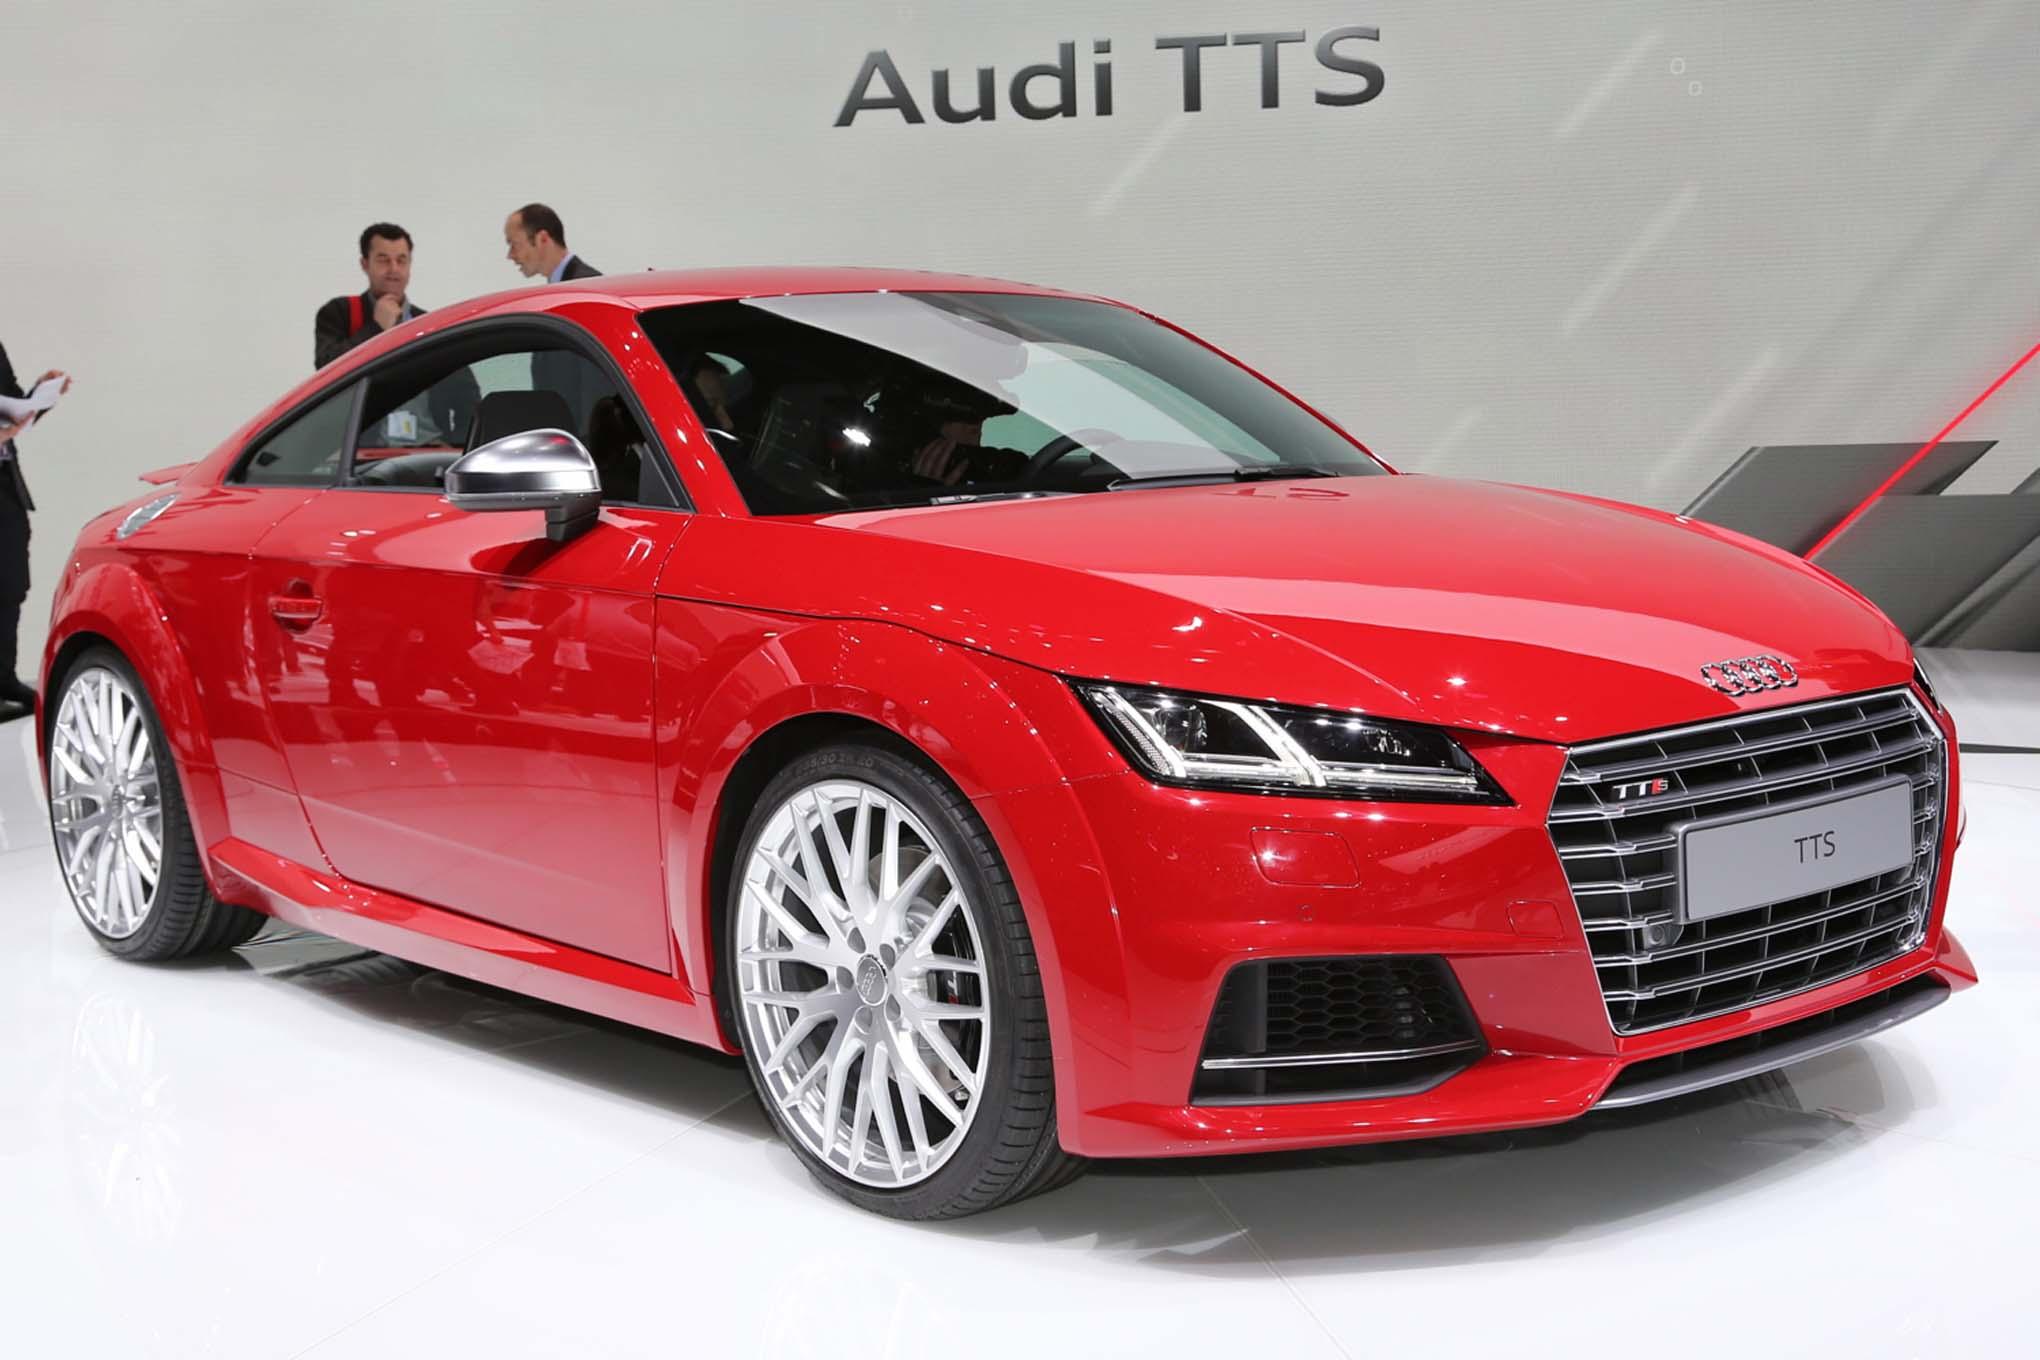 2016 Audi Tts Exterior Profile (View 28 of 41)